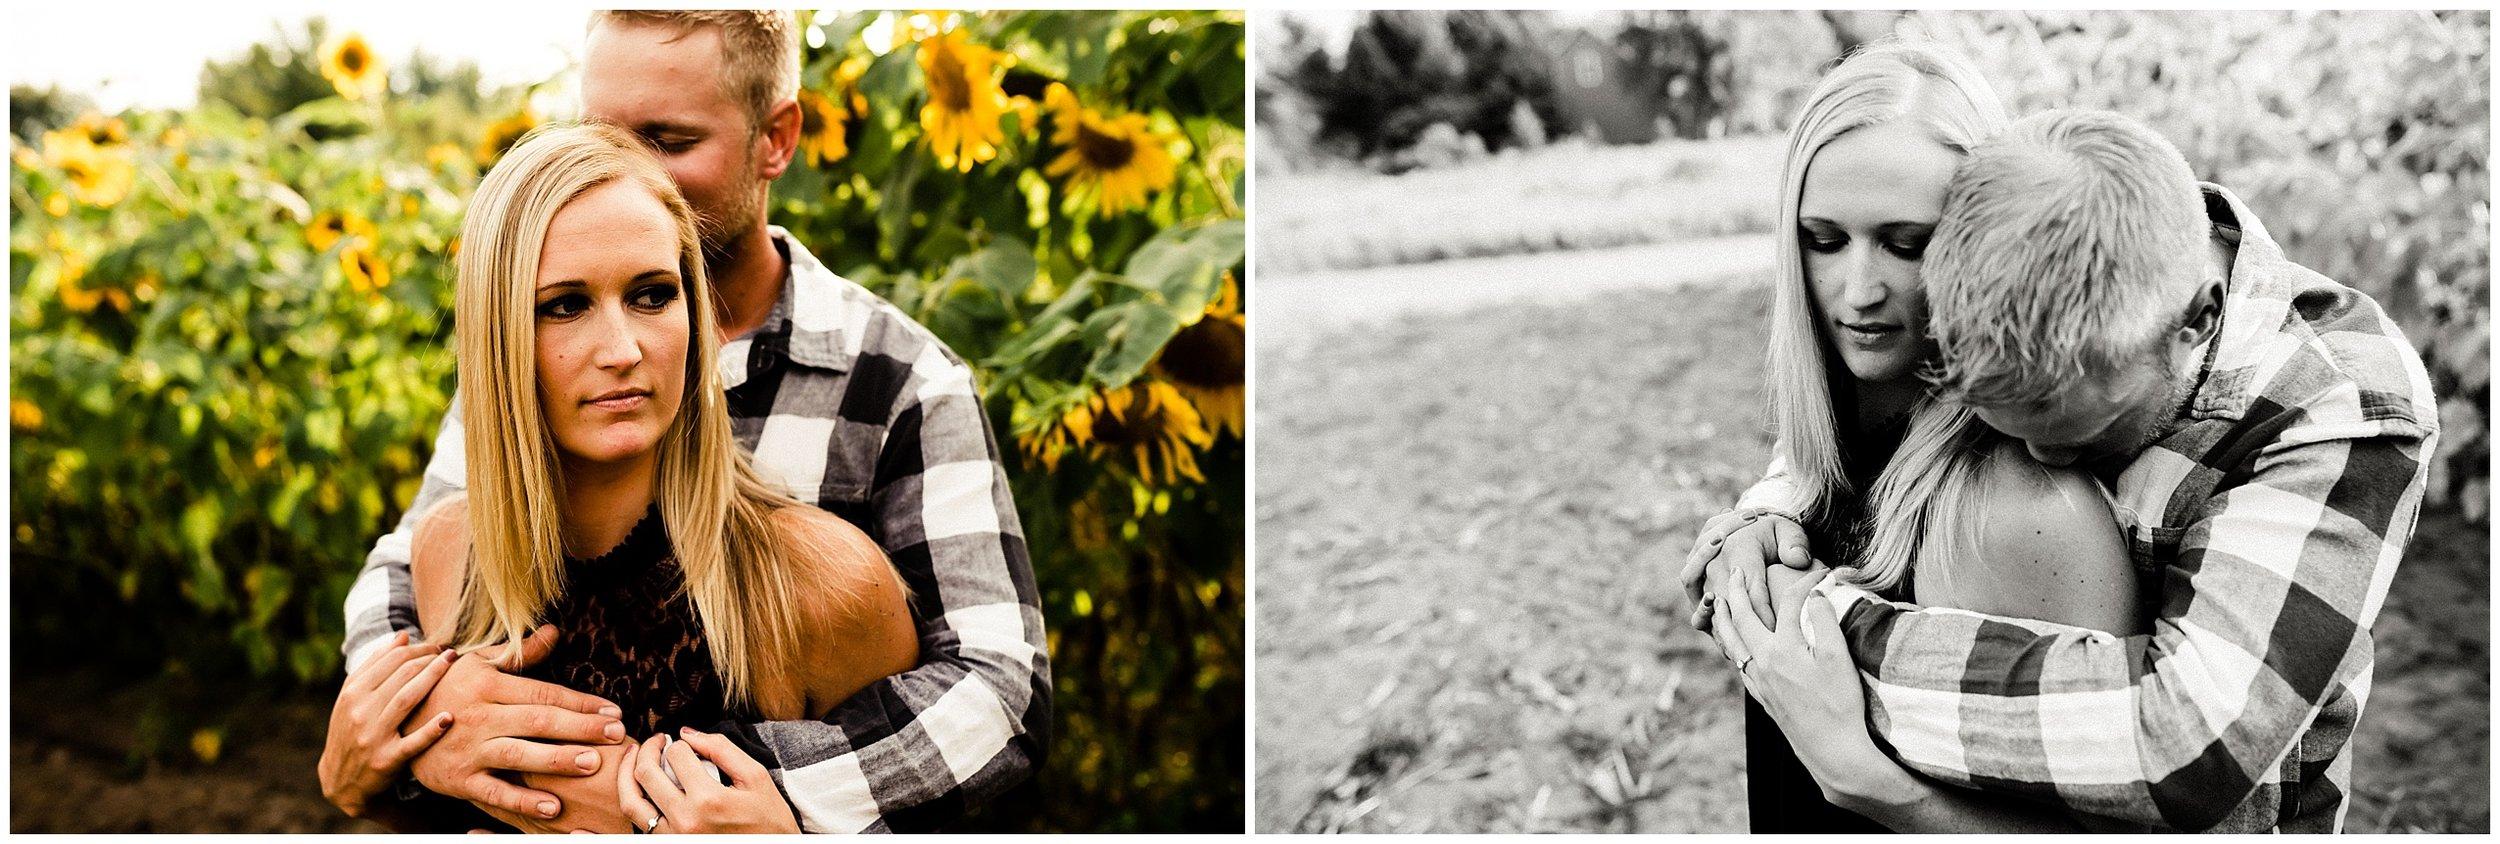 Ben + Haily | Engaged #kyleepaigephotography_1133.jpg